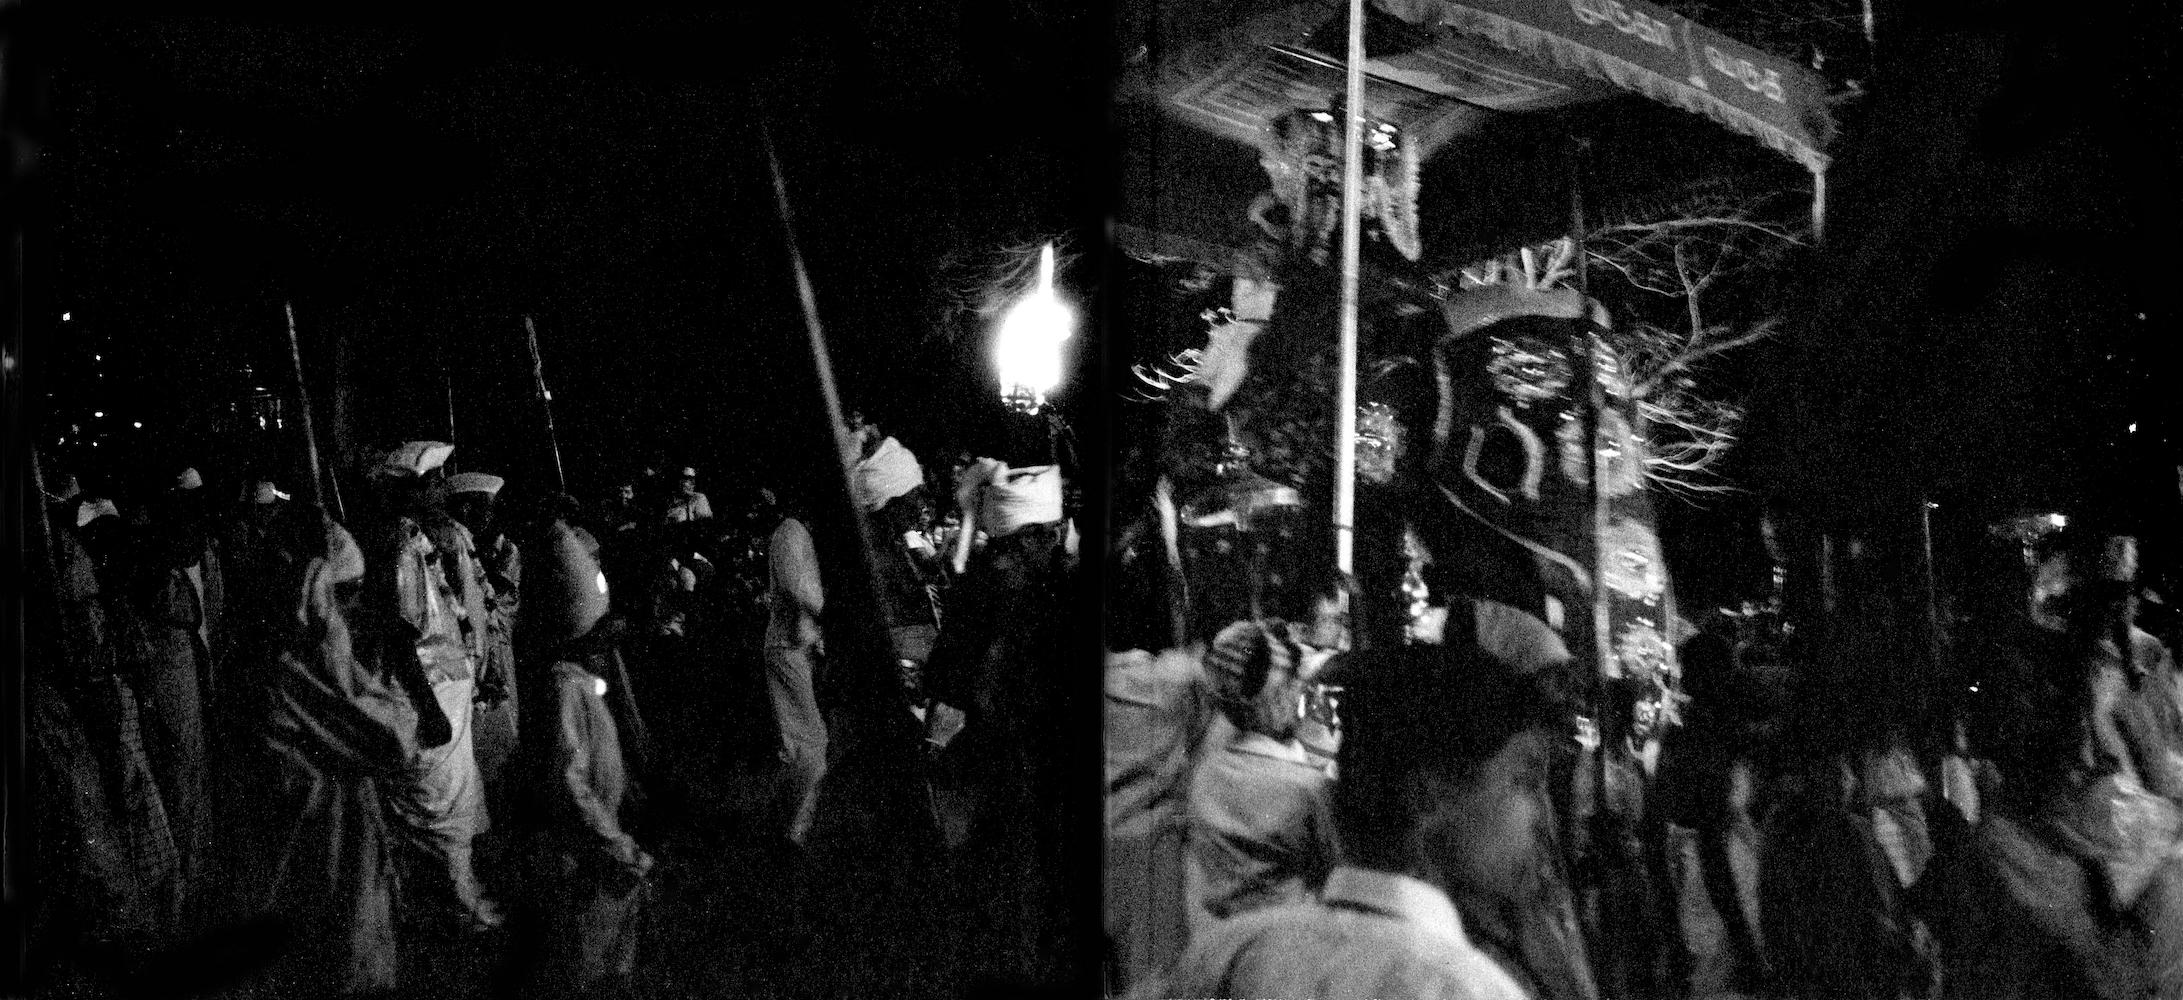 Sri Lanka9a024 Kopie